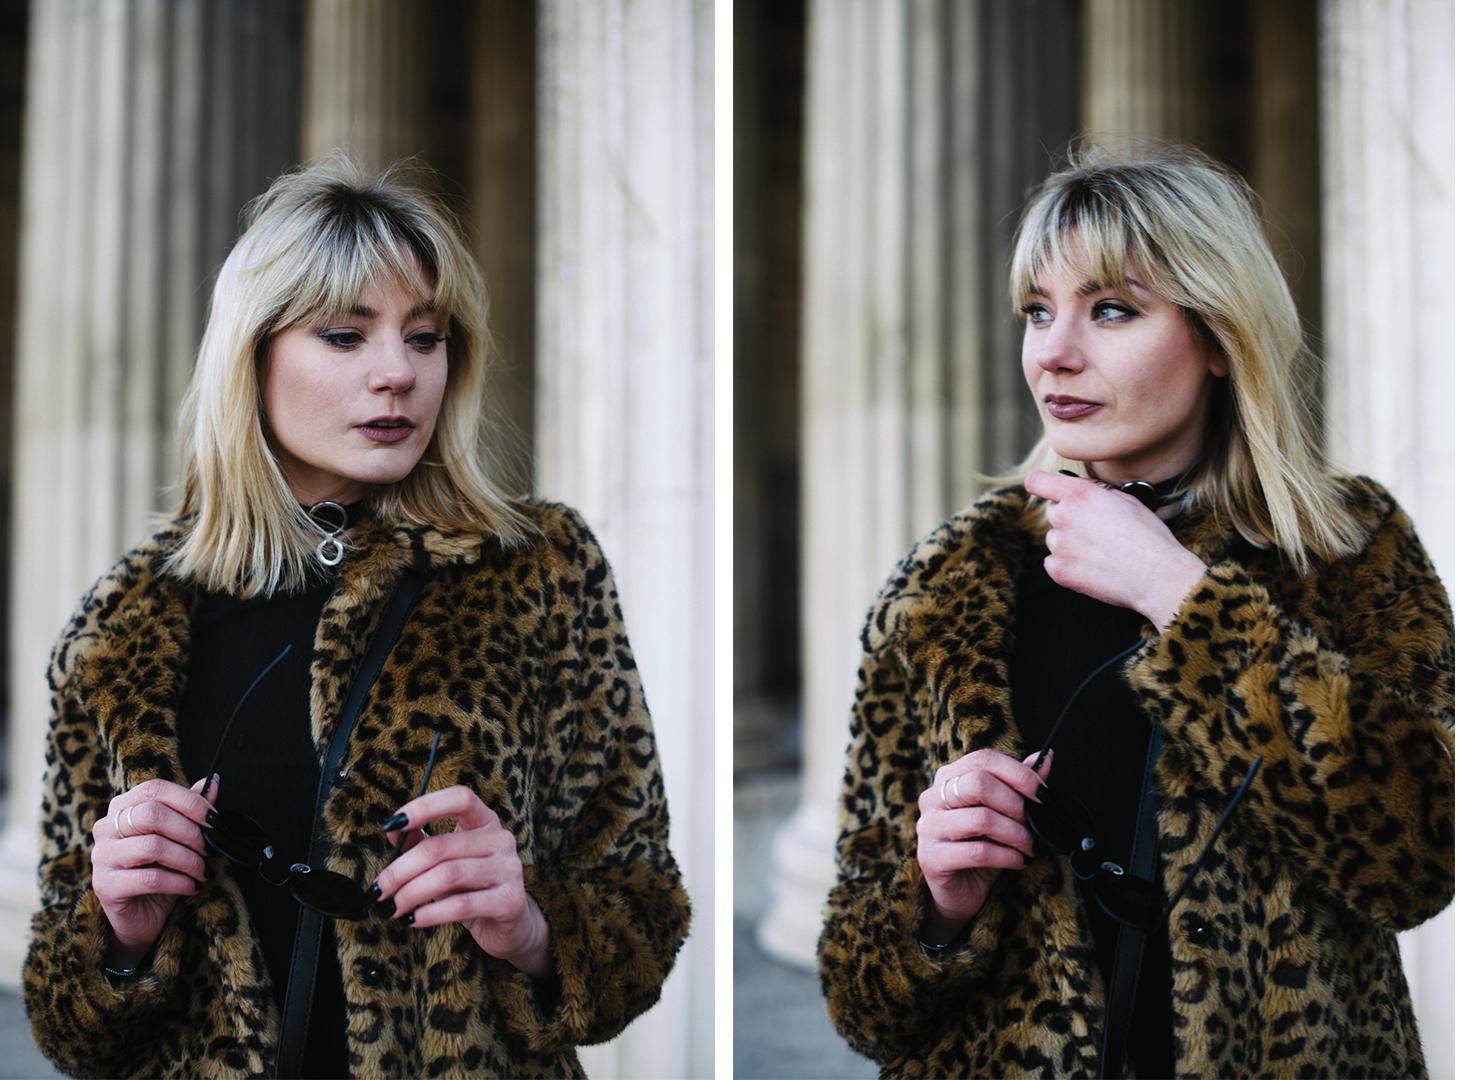 Kiamisu_Modeblog_Fashionblog_Beautyblog_Leo Mantel_Zara_Leo Mantel kombinieren-collage3